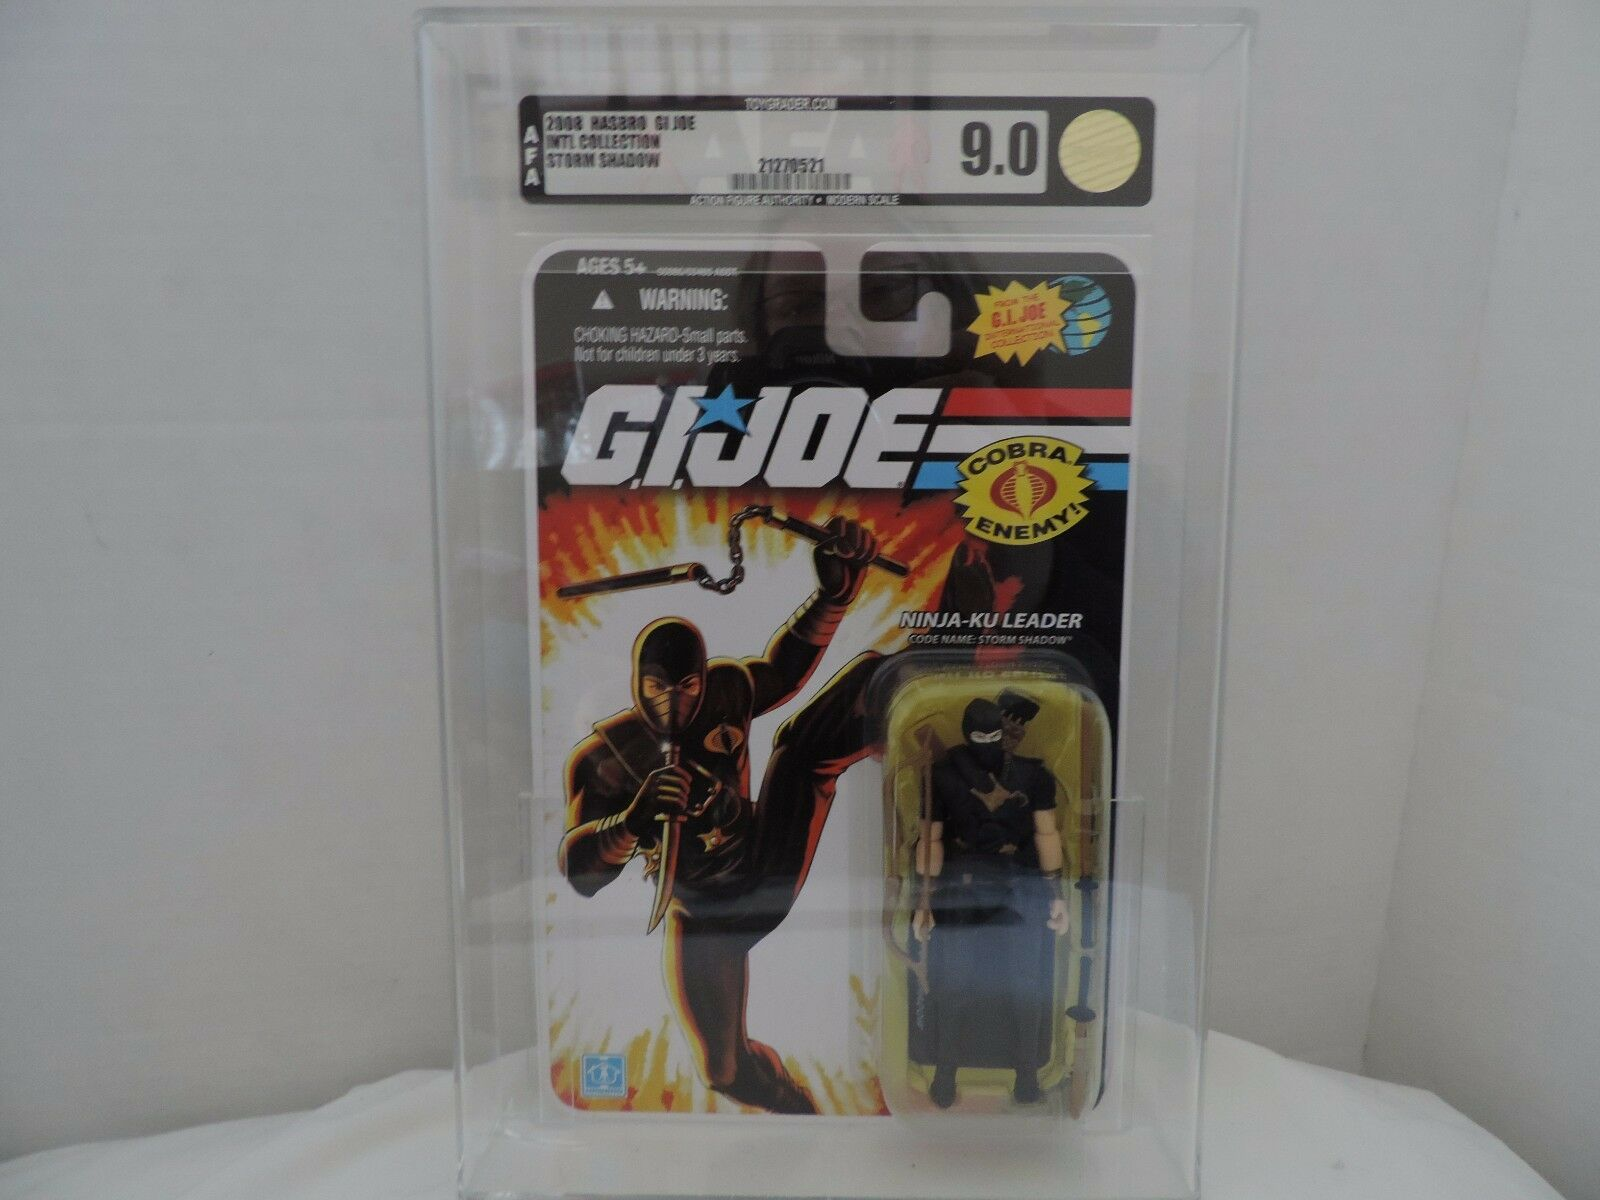 Gi - joe 2008 ninja ku storm shadow action - figur für 90